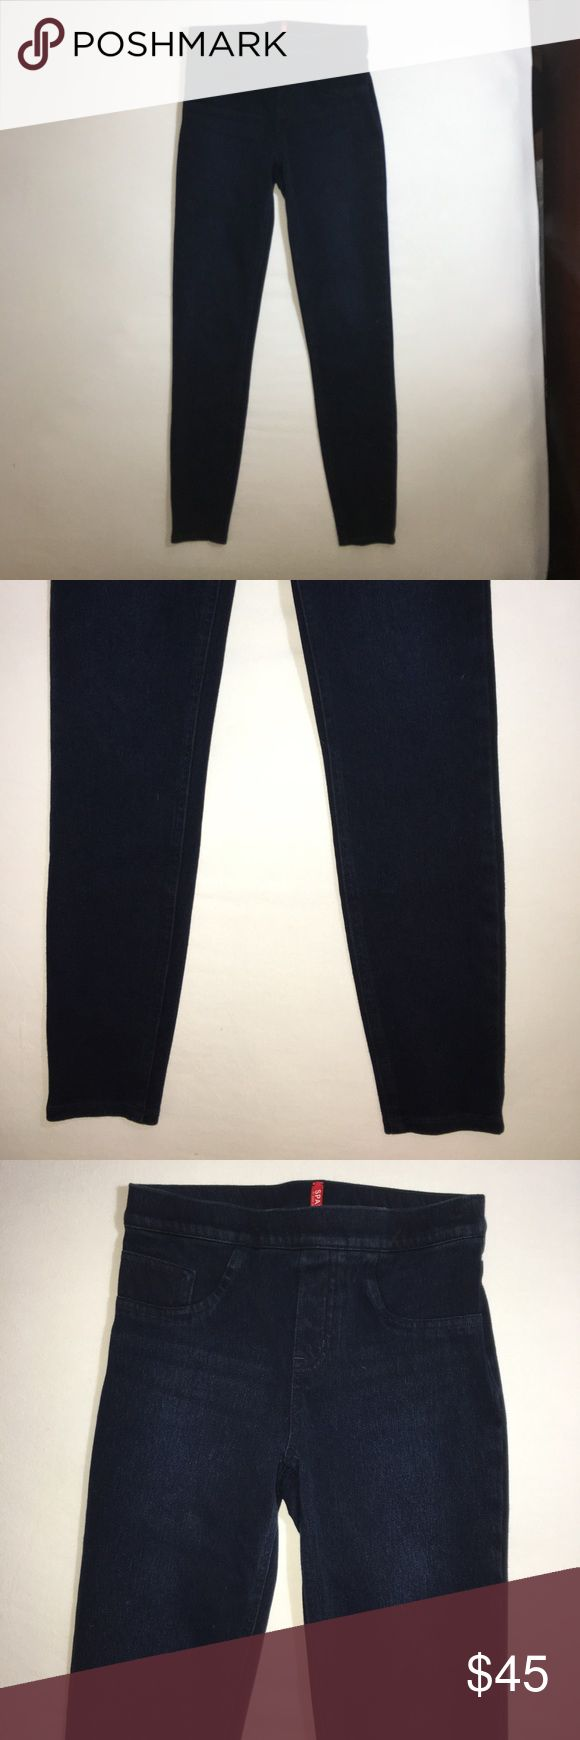 Navy Blue Leggings In Good Condition. SPANX Pants Leggings